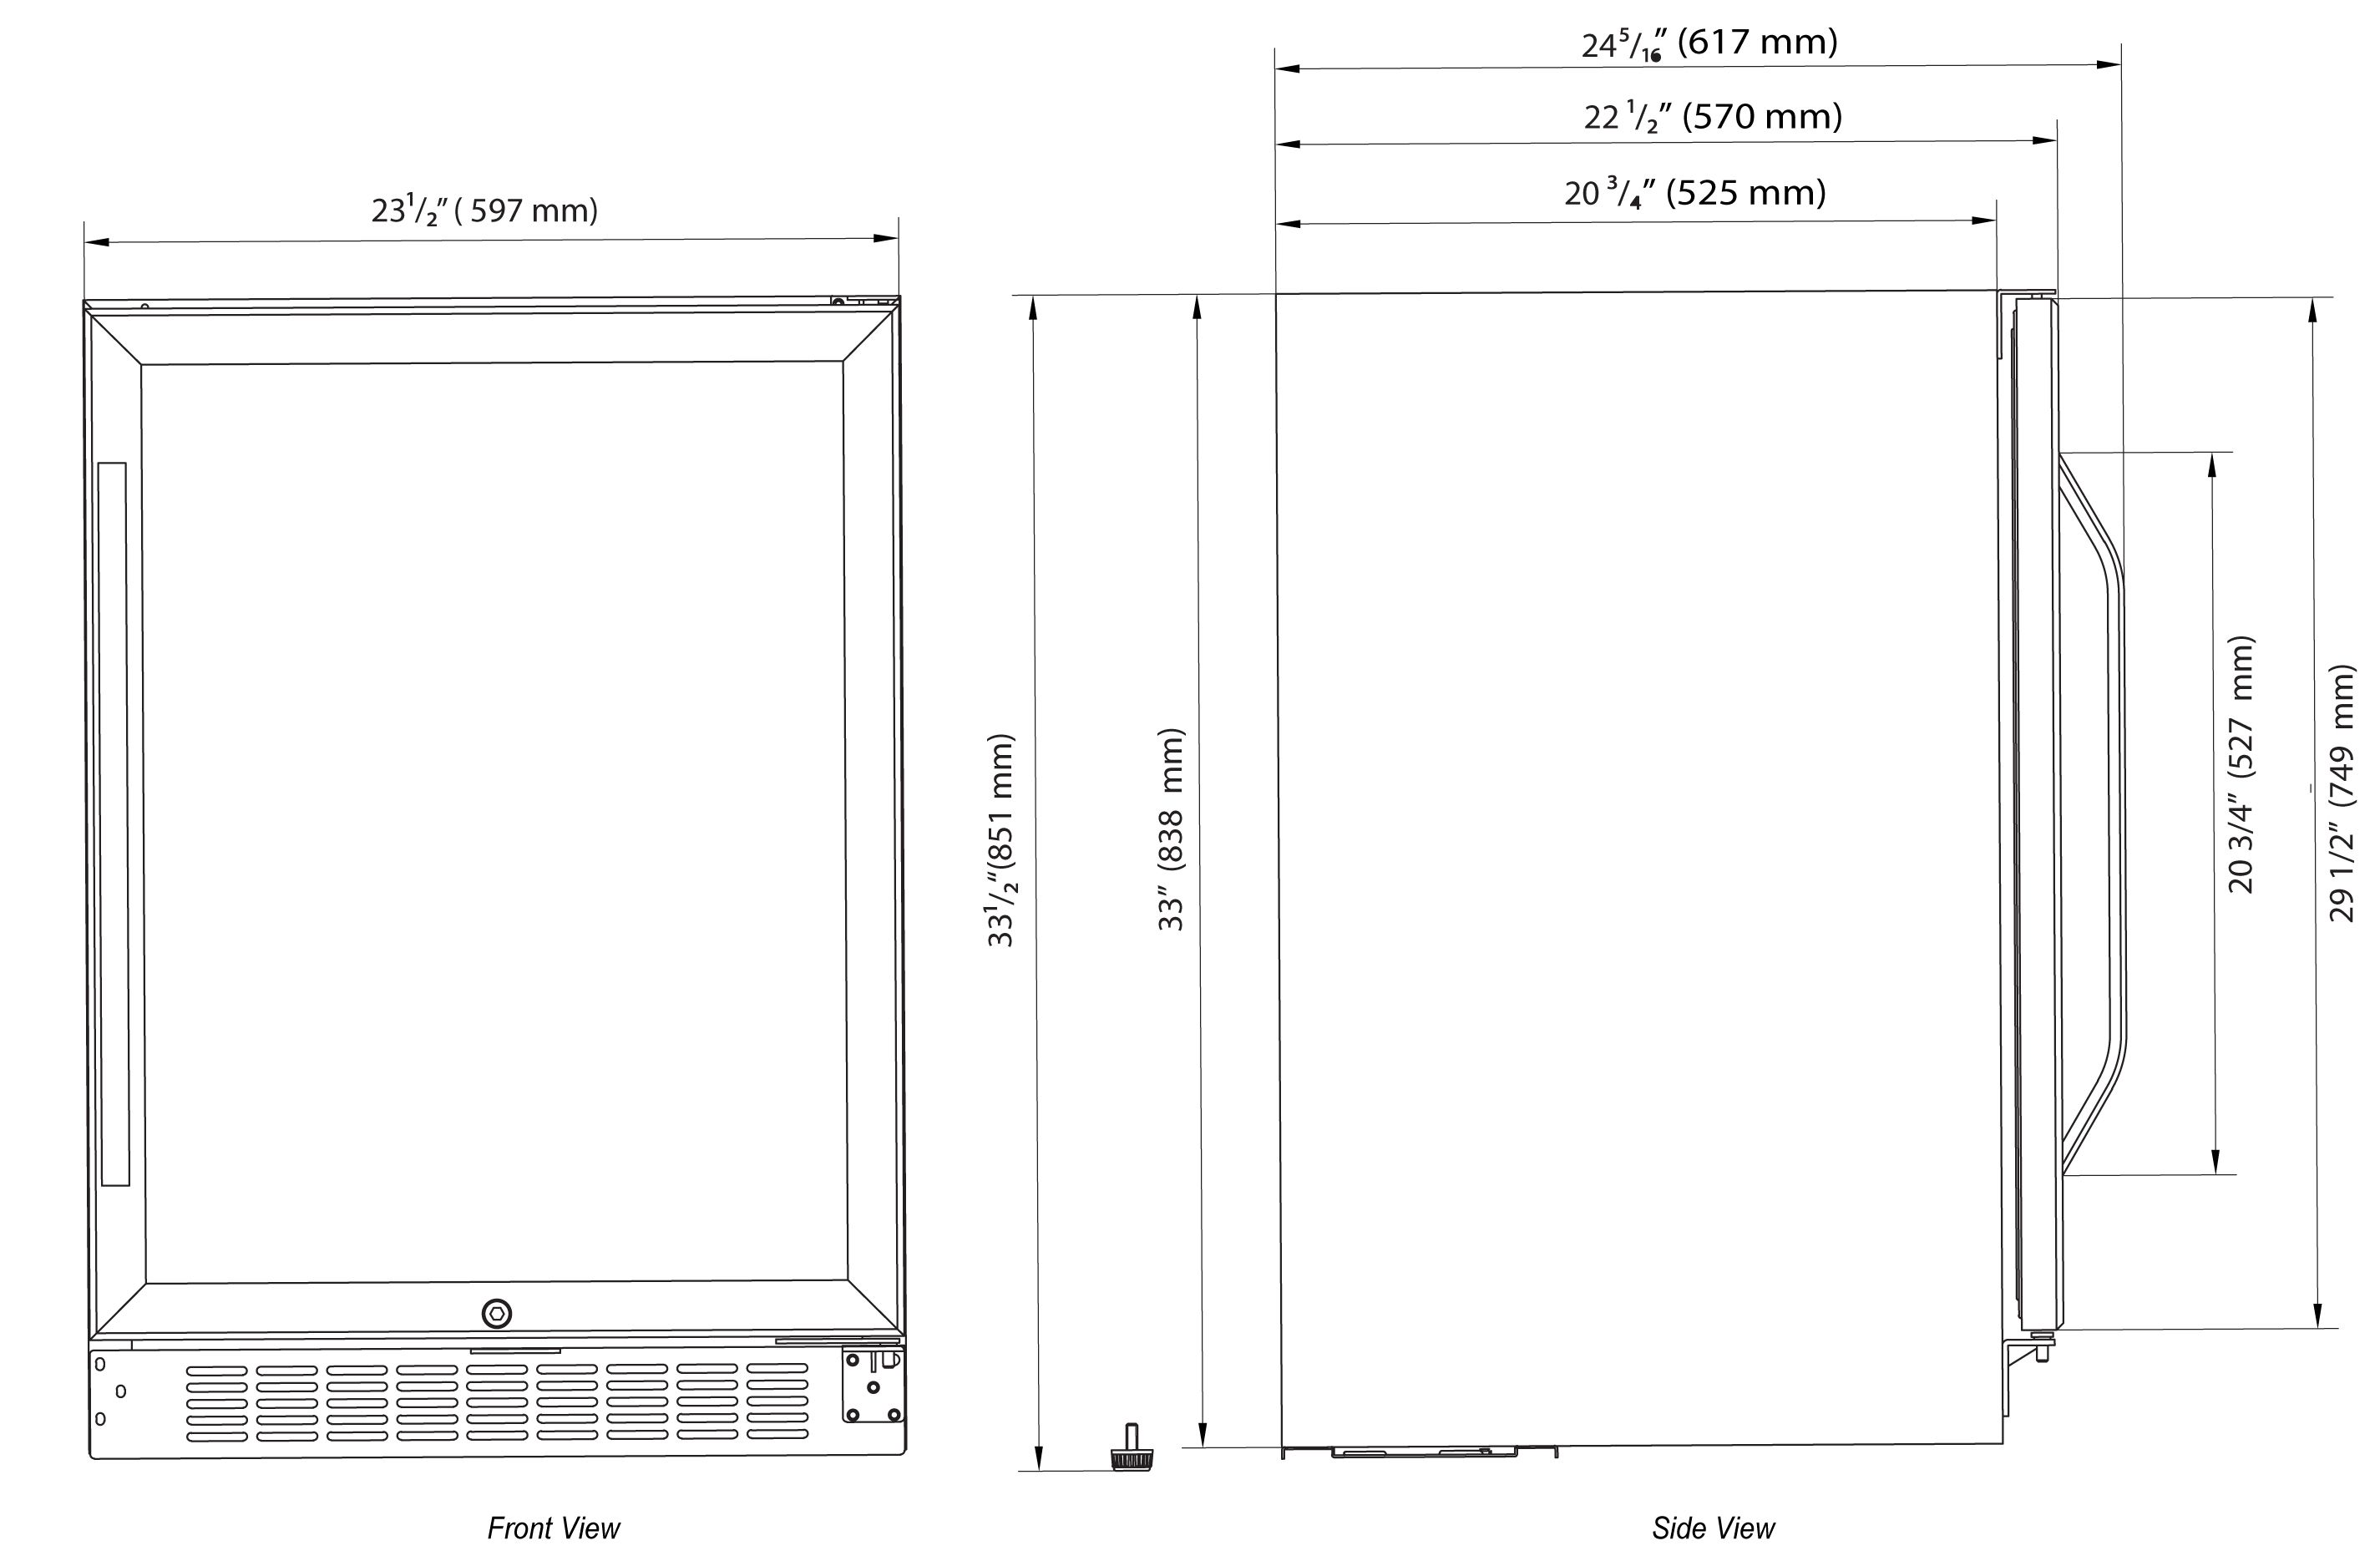 hight resolution of edgestar wiring diagram wiring diagram filteredgestar wiring diagram wiring diagram data val edgestar wiring diagram